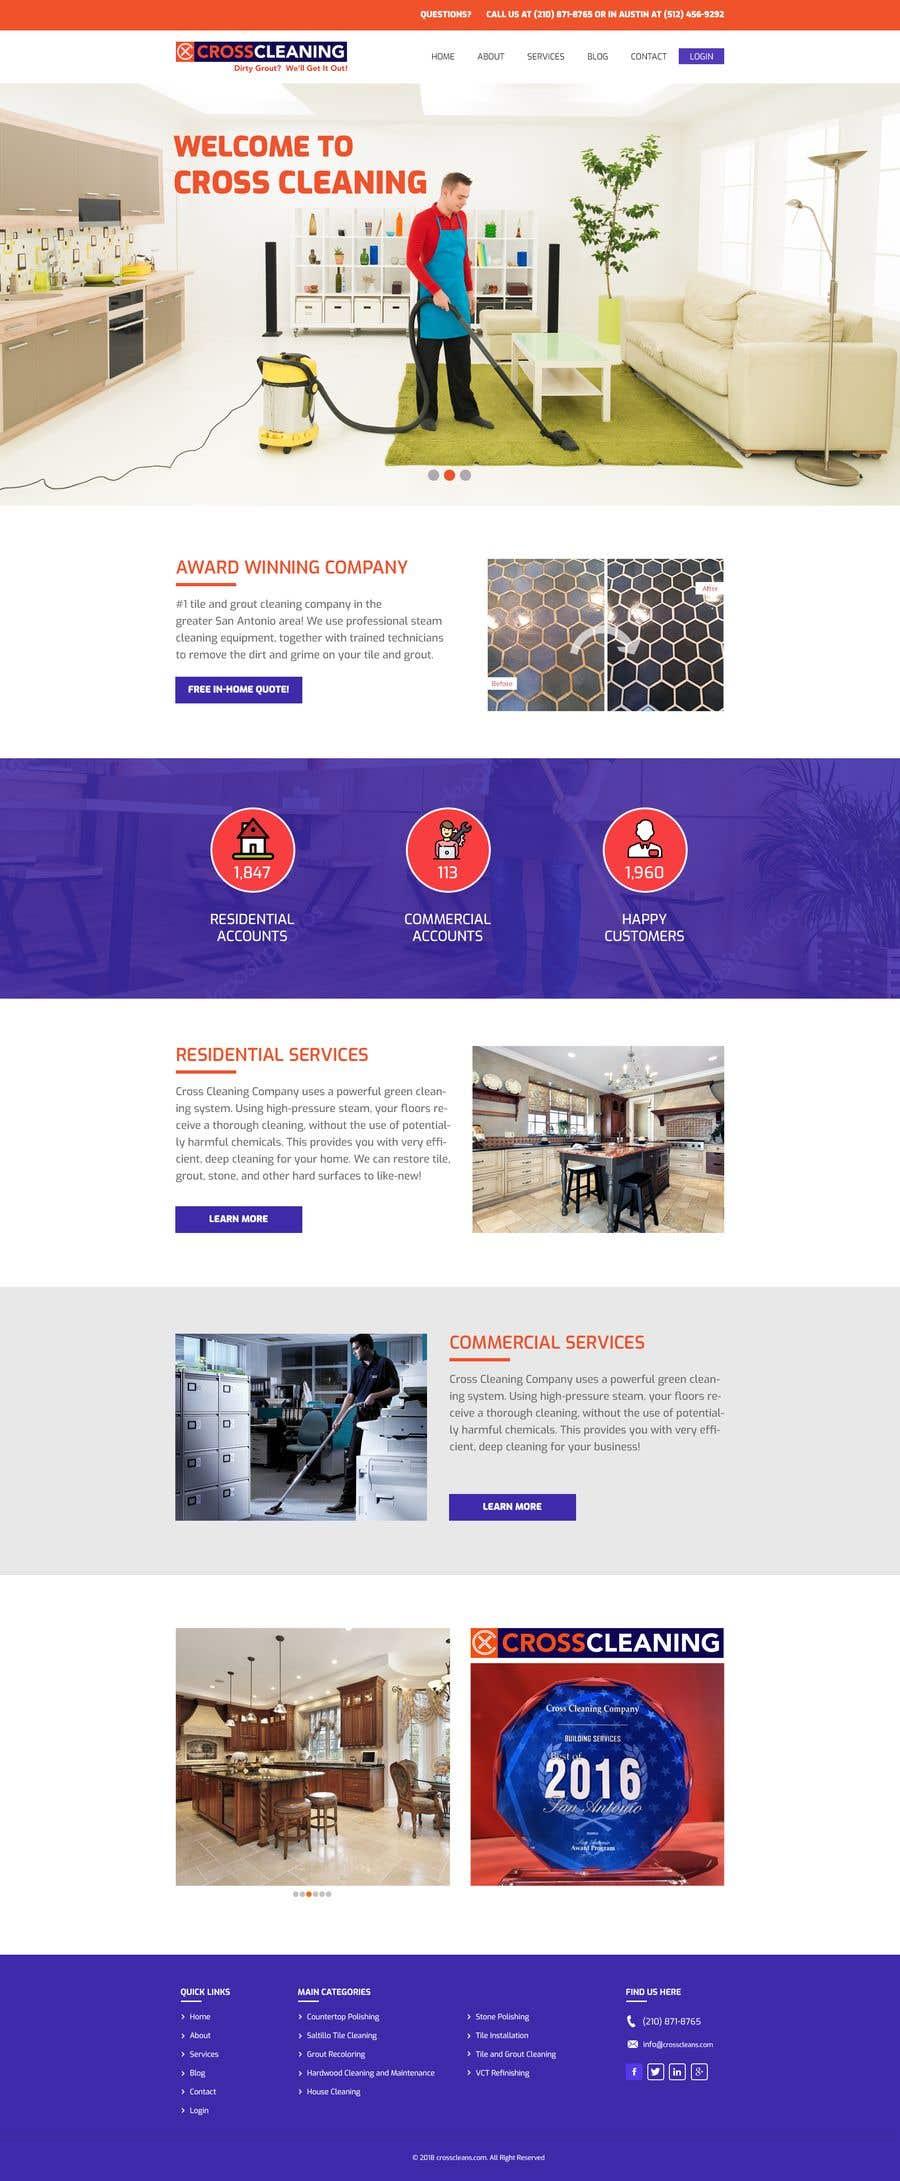 Kilpailutyö #35 kilpailussa Wow Me with Creative Redesign of Wordpress Website